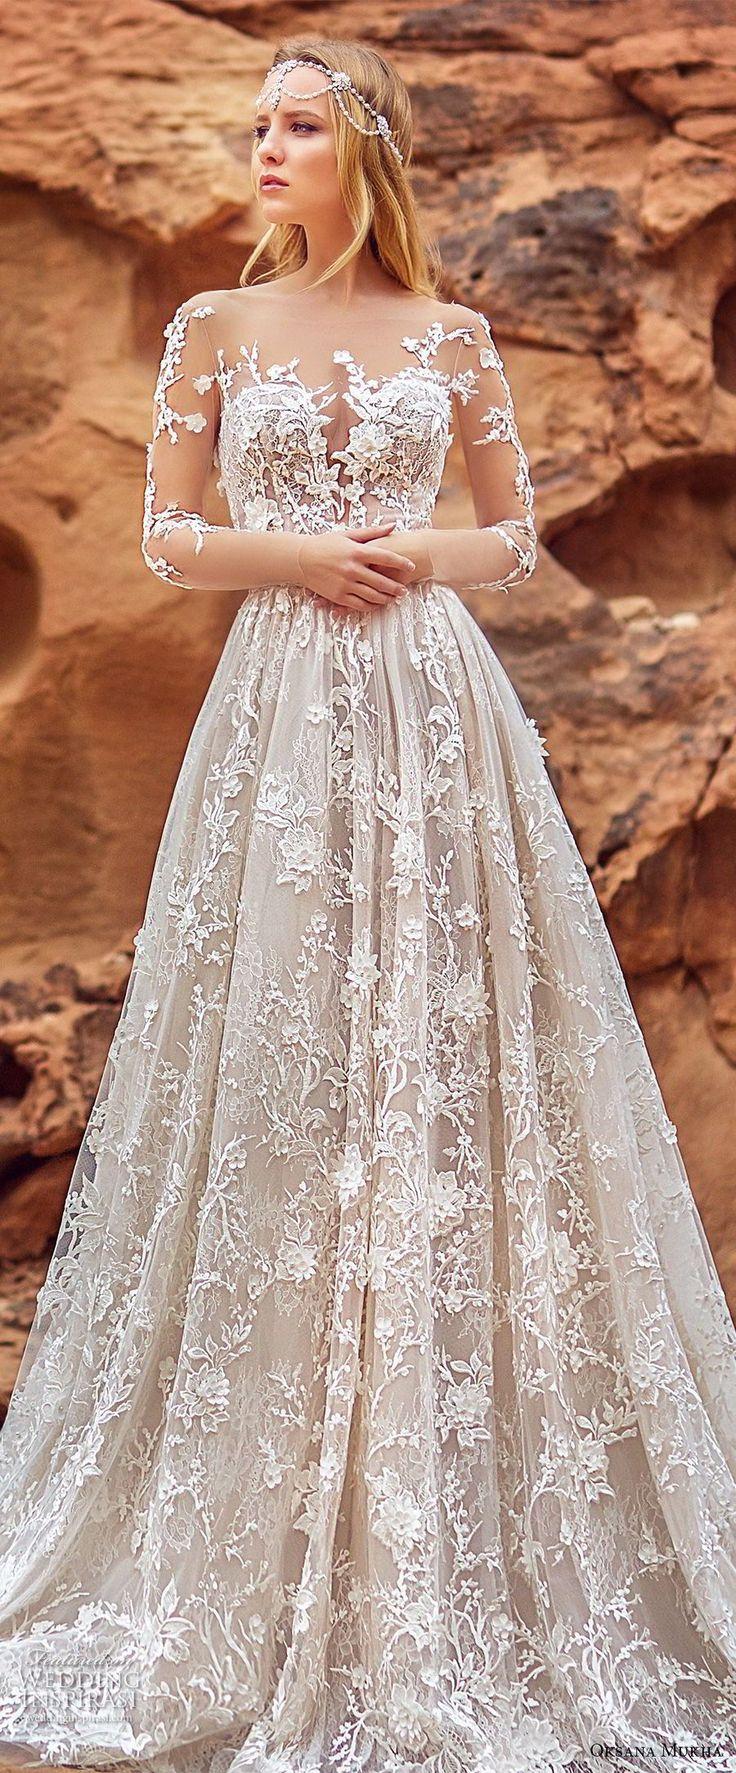 Zelda wedding dress   best Wedding Already planned images on Pinterest  Gown wedding